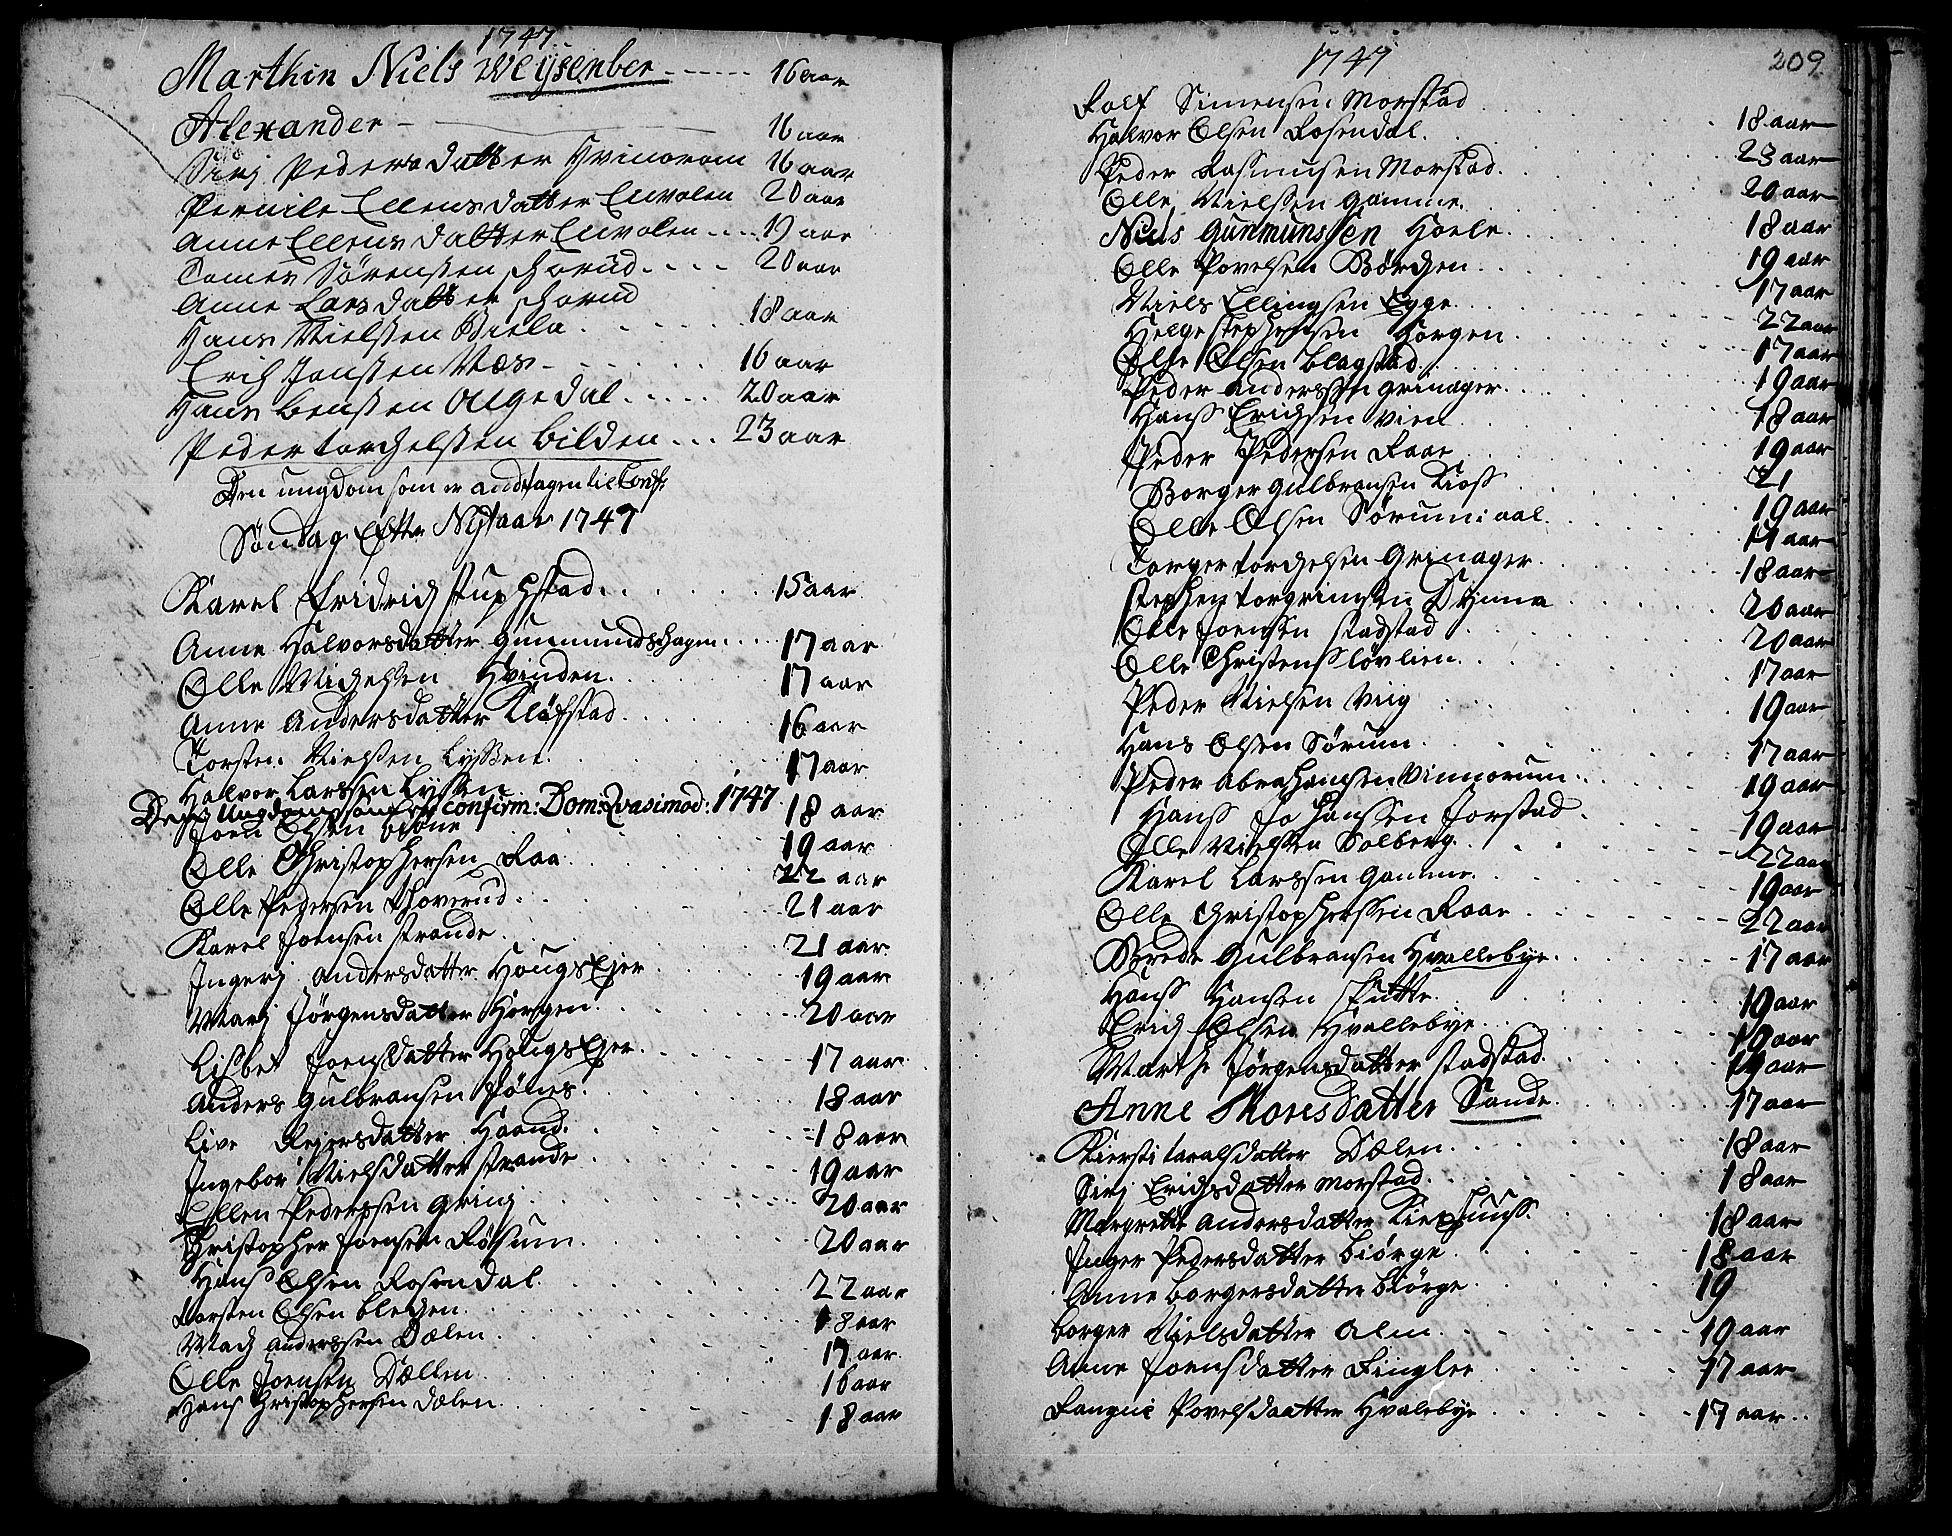 SAH, Gran prestekontor, Ministerialbok nr. 3, 1745-1758, s. 209